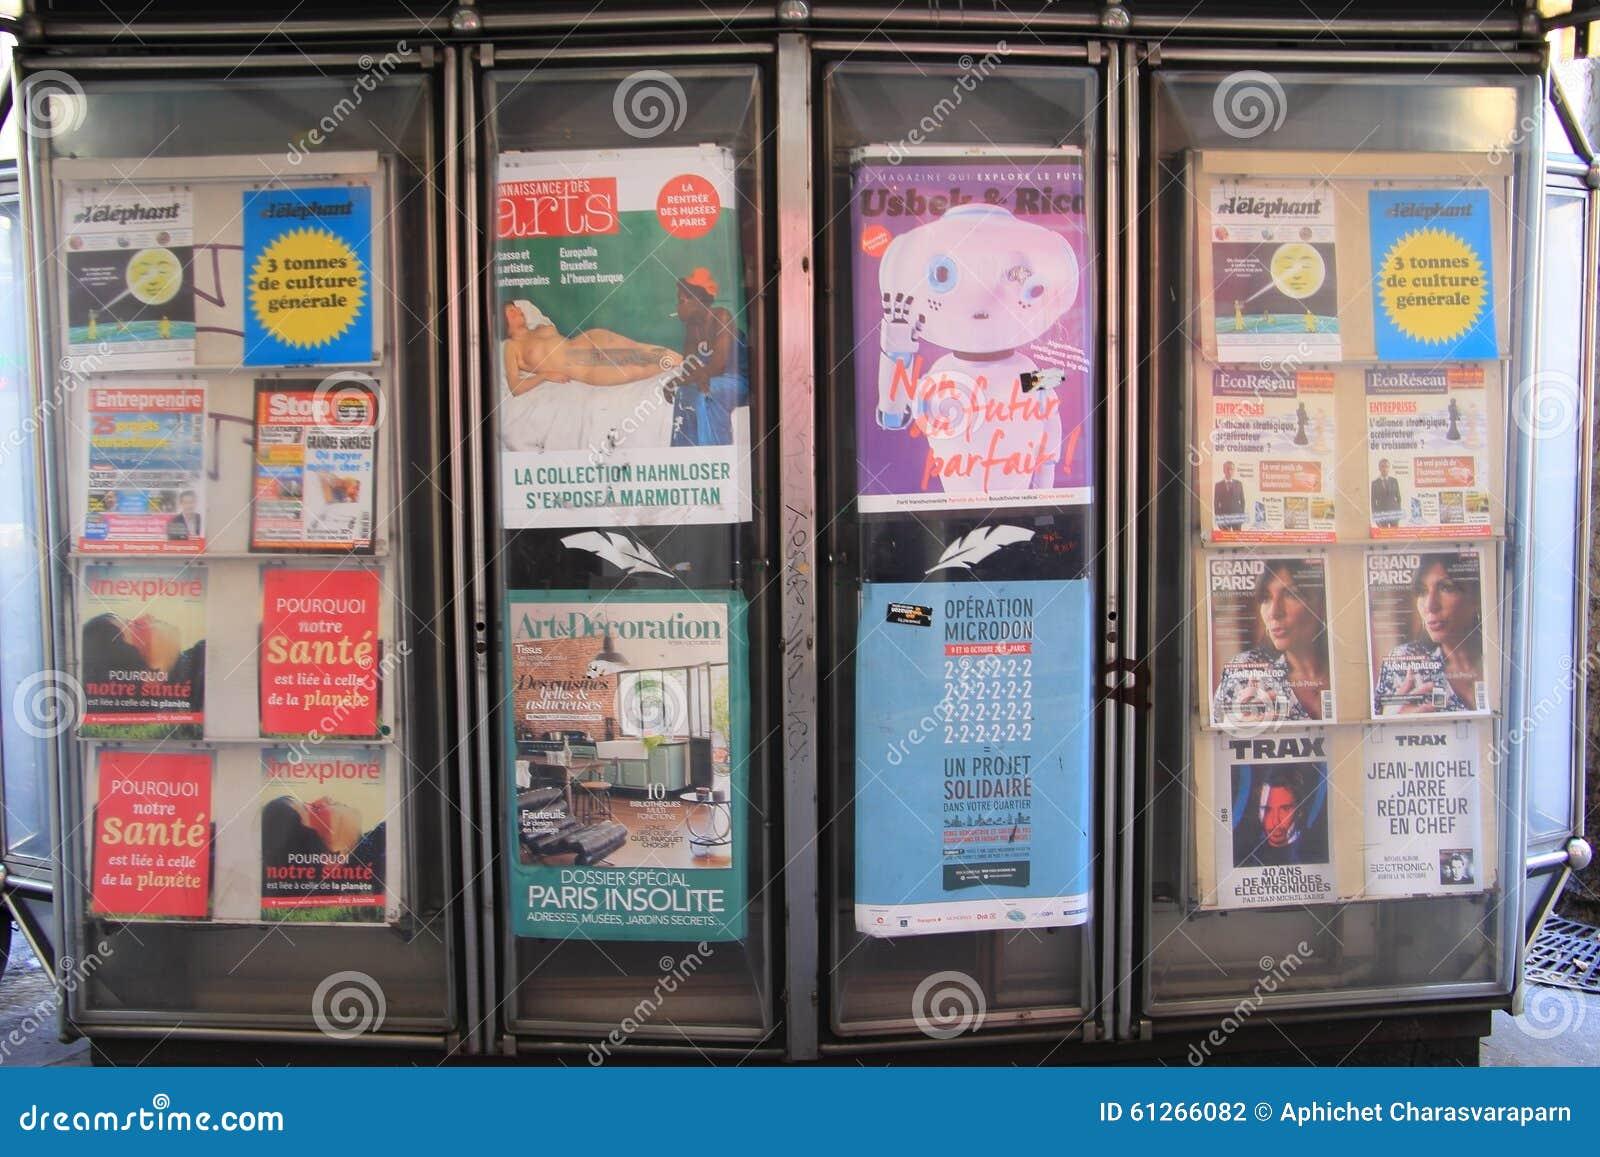 Boulevard Haussmann, Parijs - 9 Oct 15: adverterende afficheraad op voetpad op Boulevard Haussmann Rd , Parijs, Frankrijk